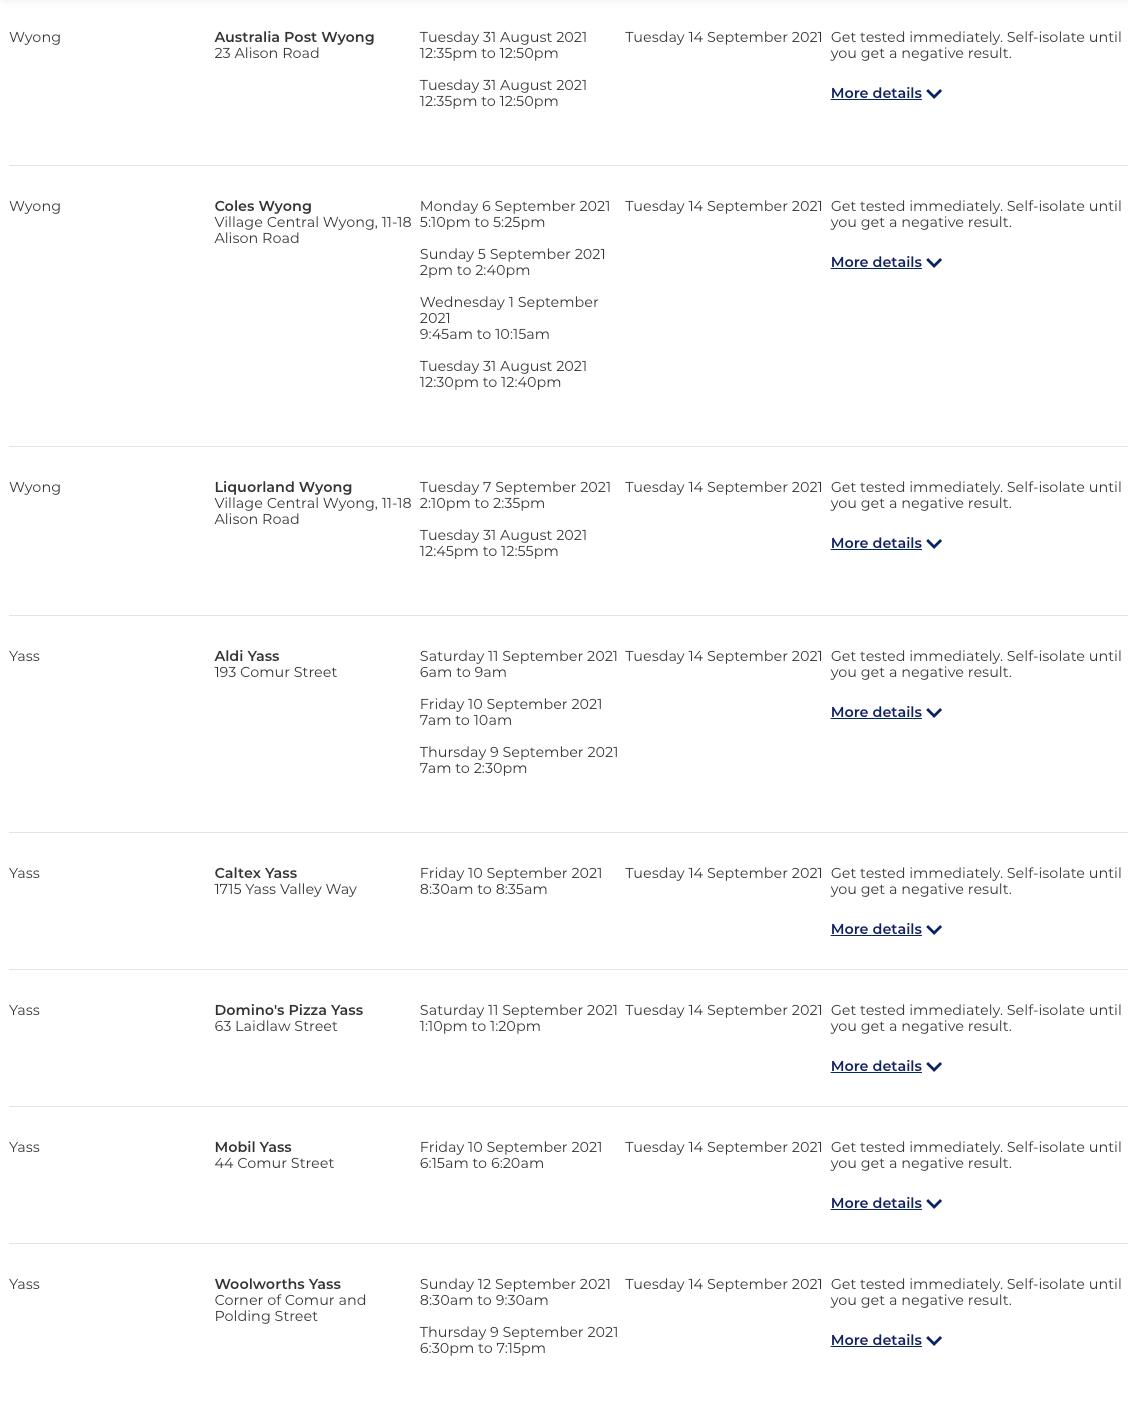 www.nsw.gov.au_covid-19_nsw-covid-19-case-locations_case-locations (32).png